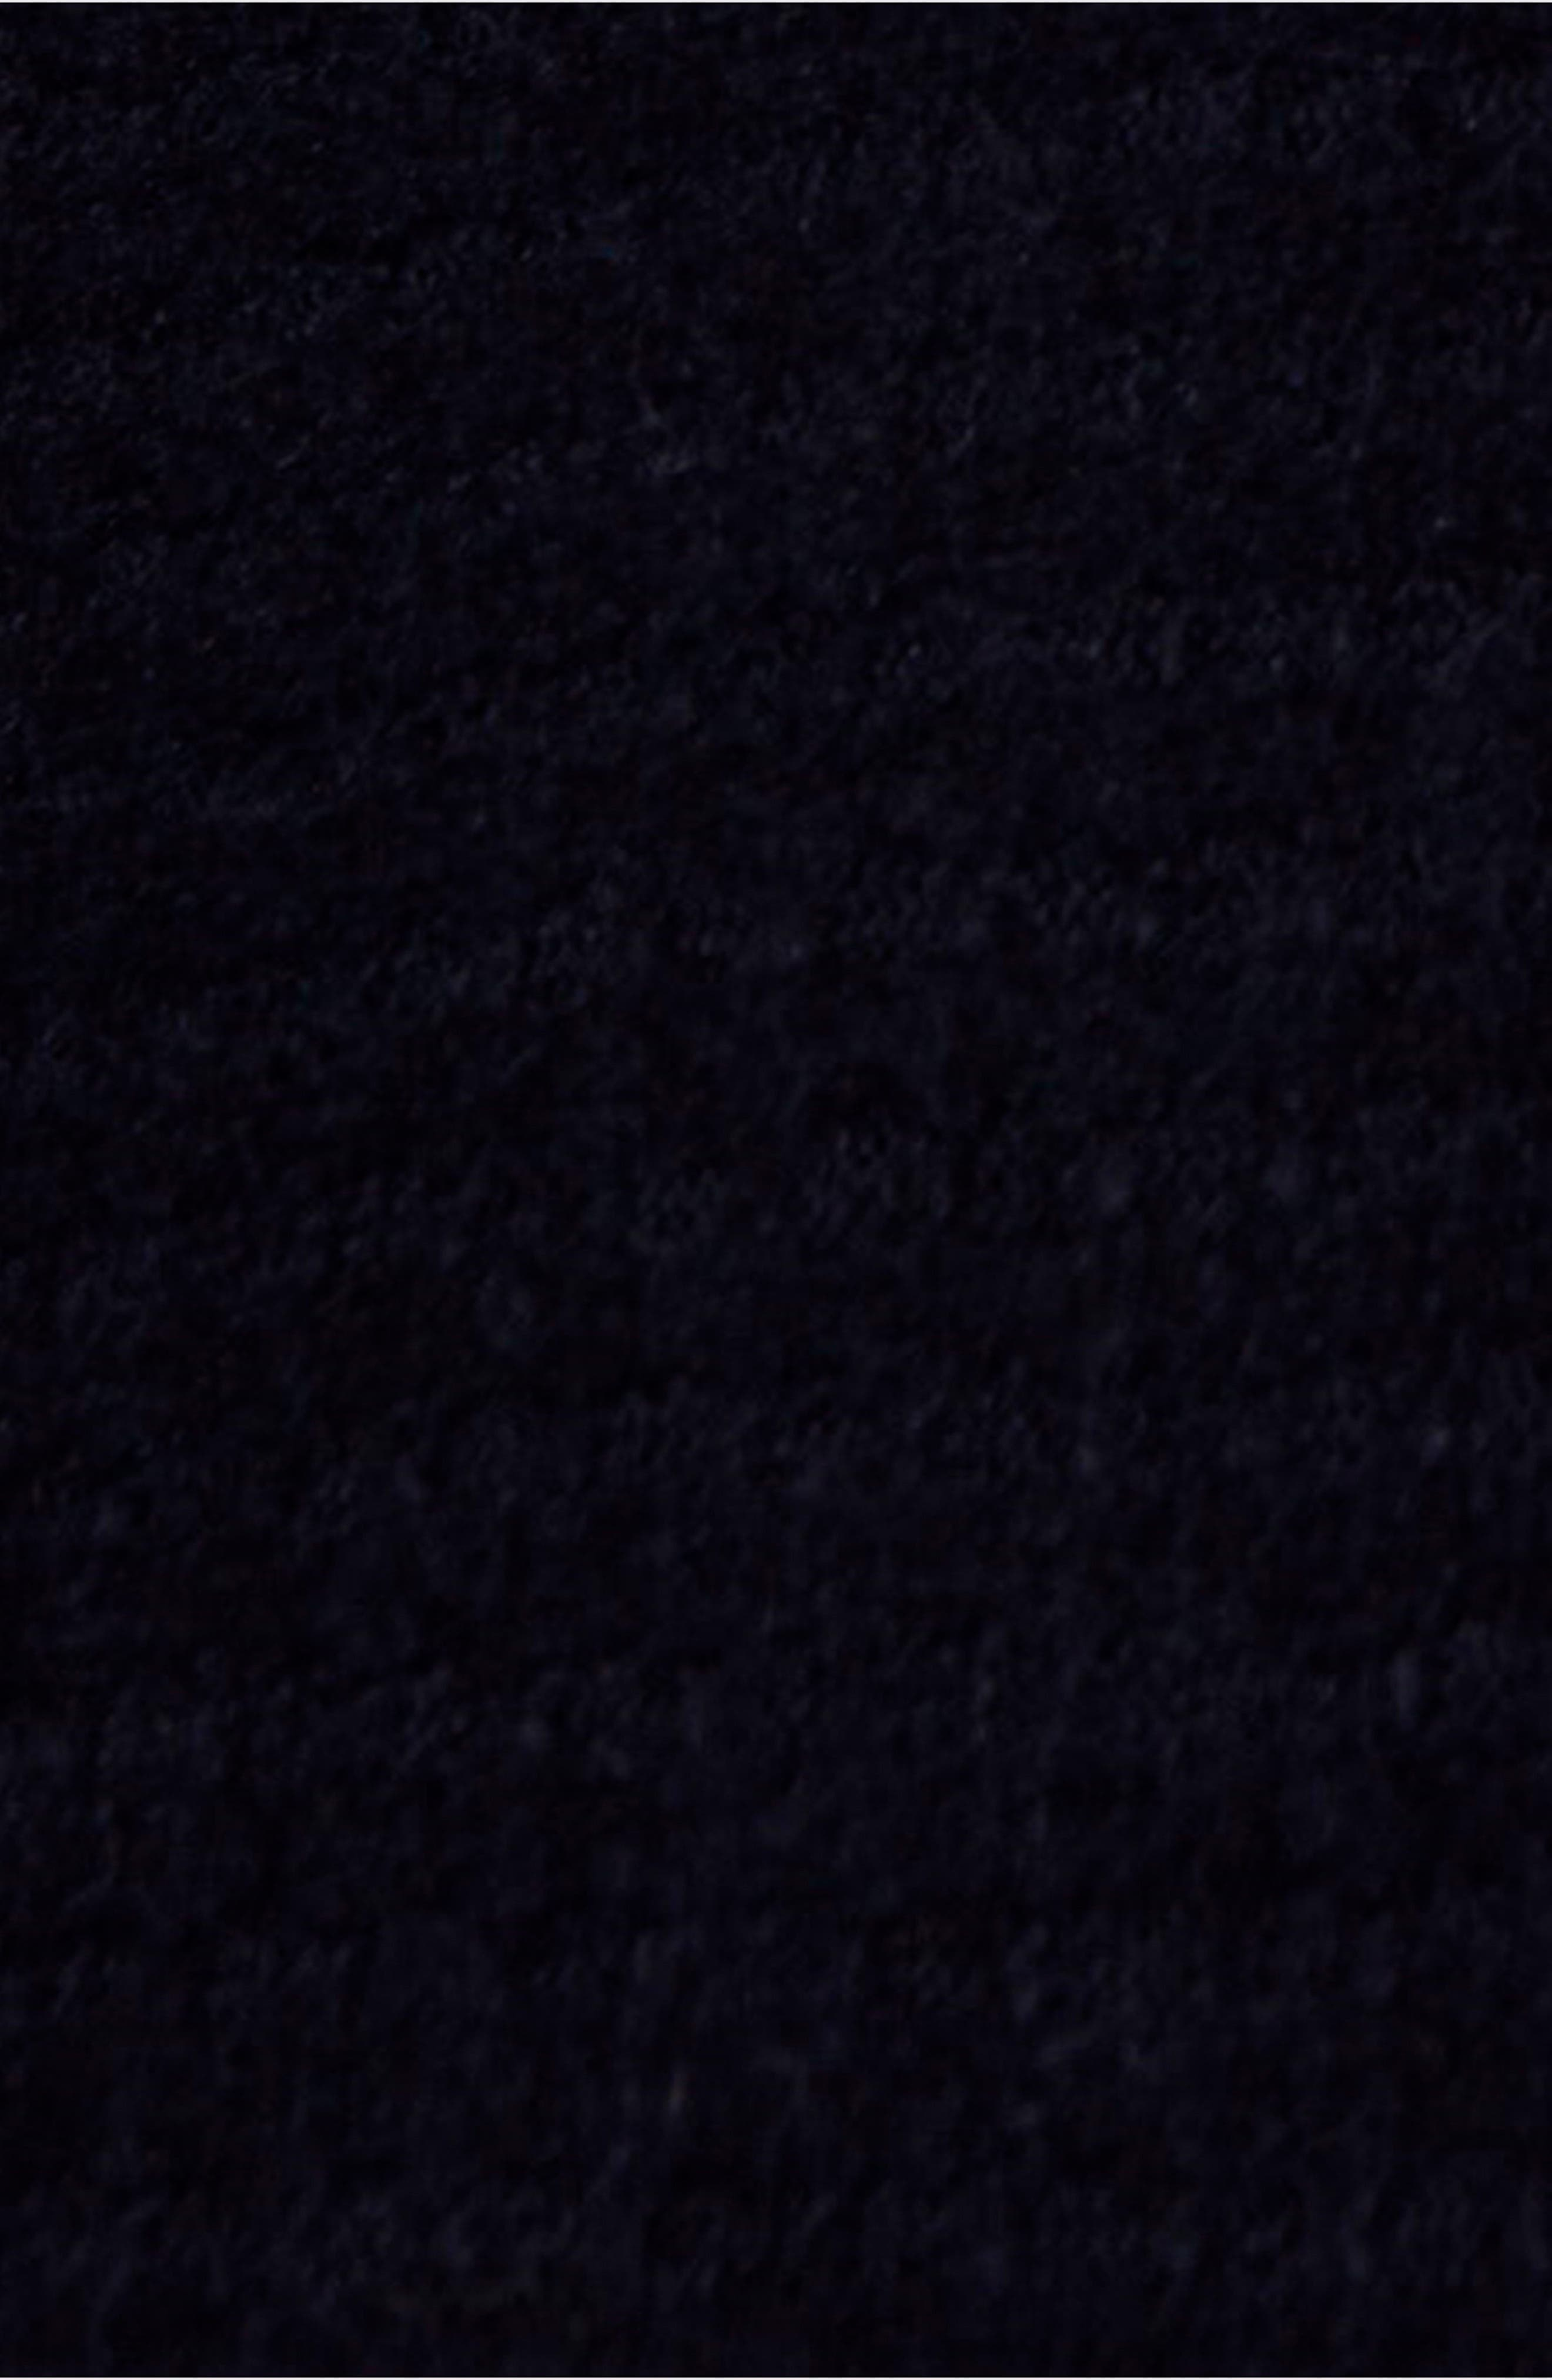 Kitty Thermal Turtleneck,                             Alternate thumbnail 5, color,                             BLACK